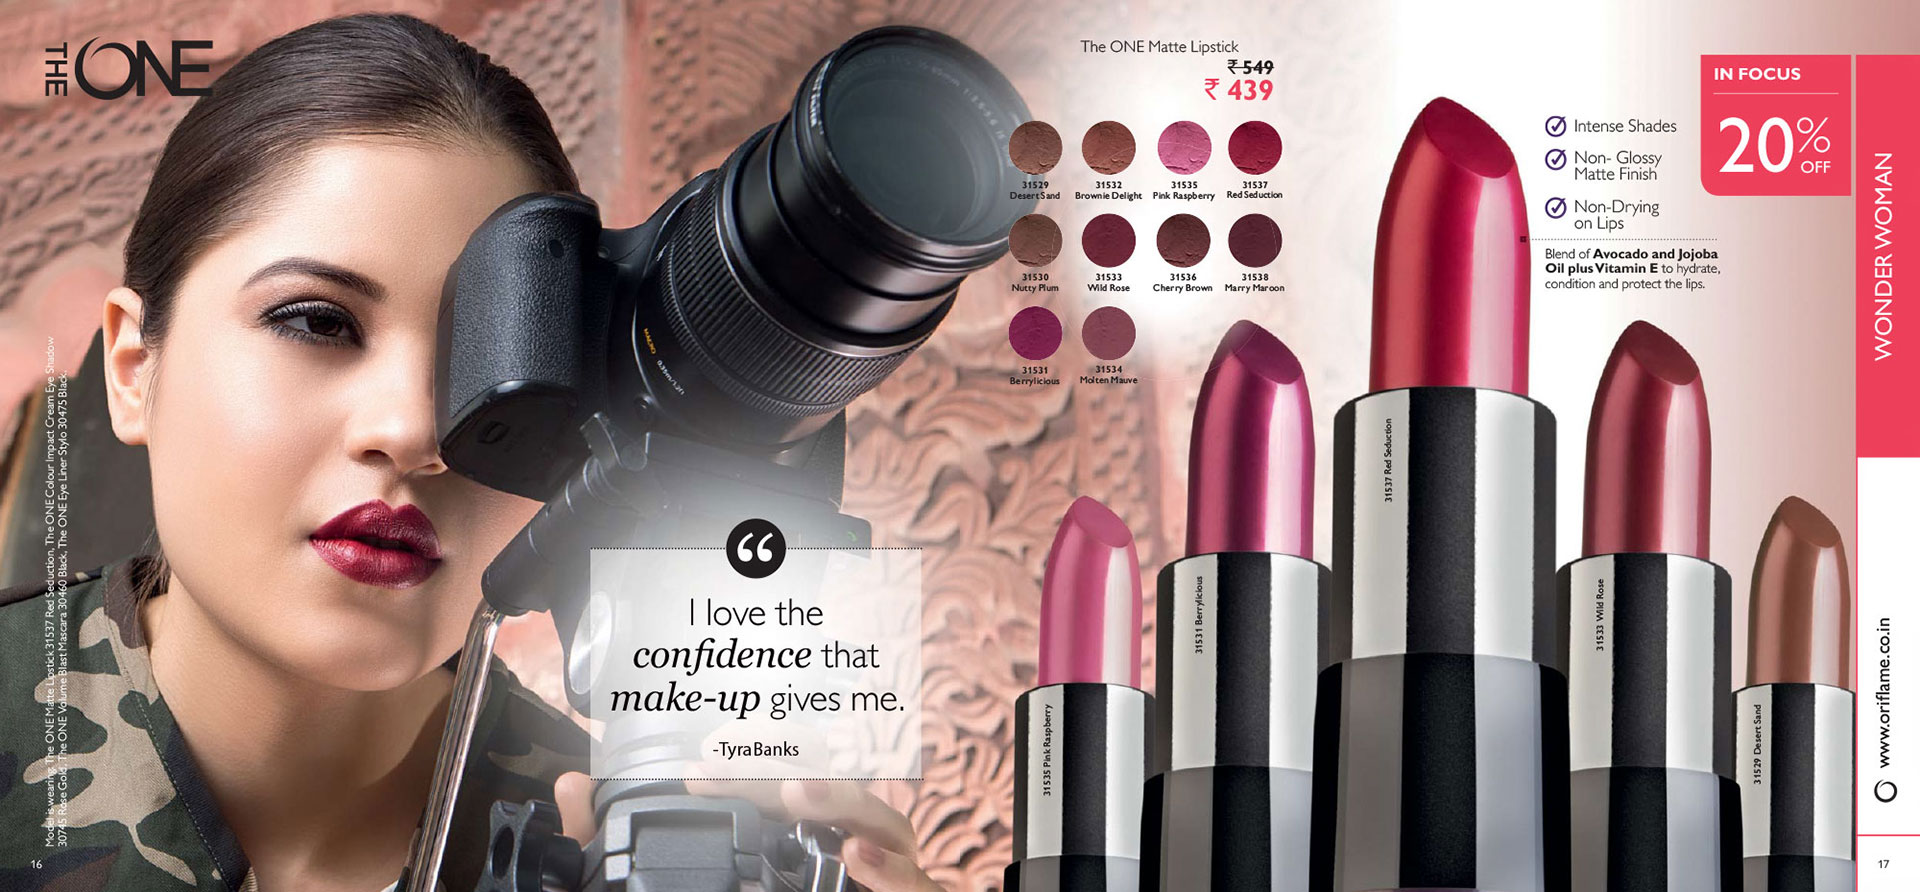 Beauty and Cosmetic Product Photographer Delhi Dubai Mumbai